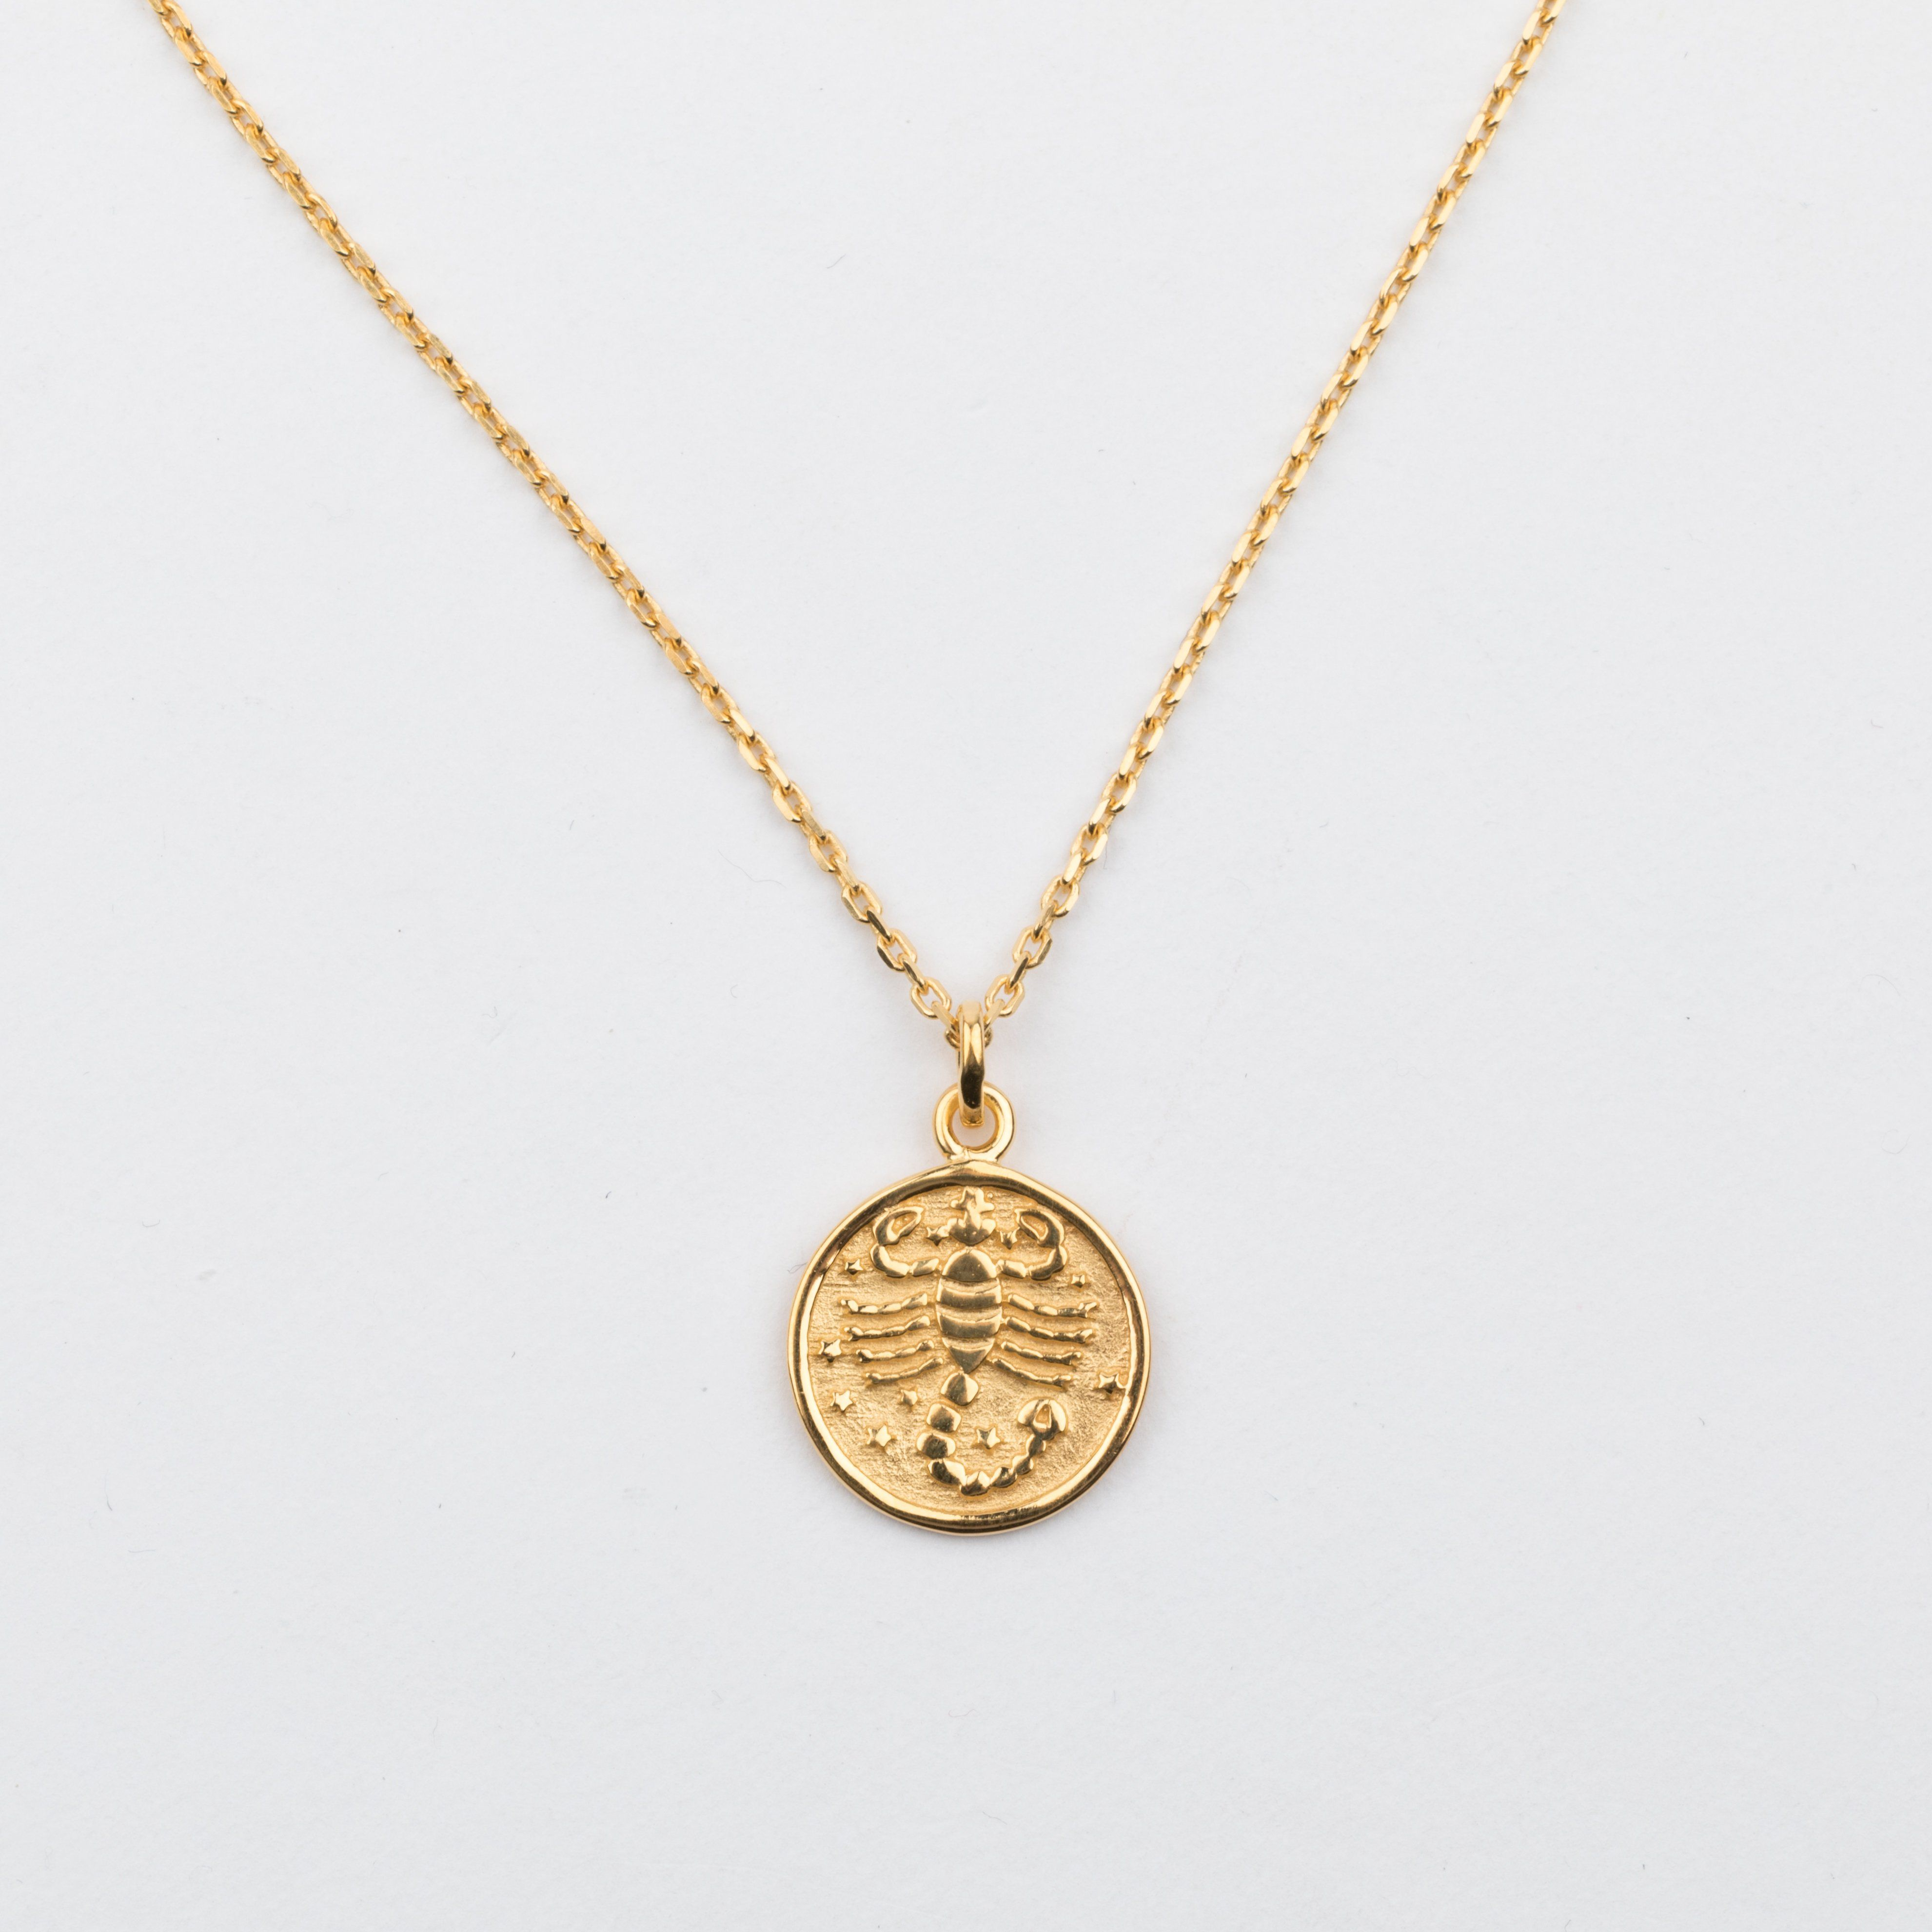 K Gold Vermeil Scorpio Horoscope Pendant Necklace Jewelry